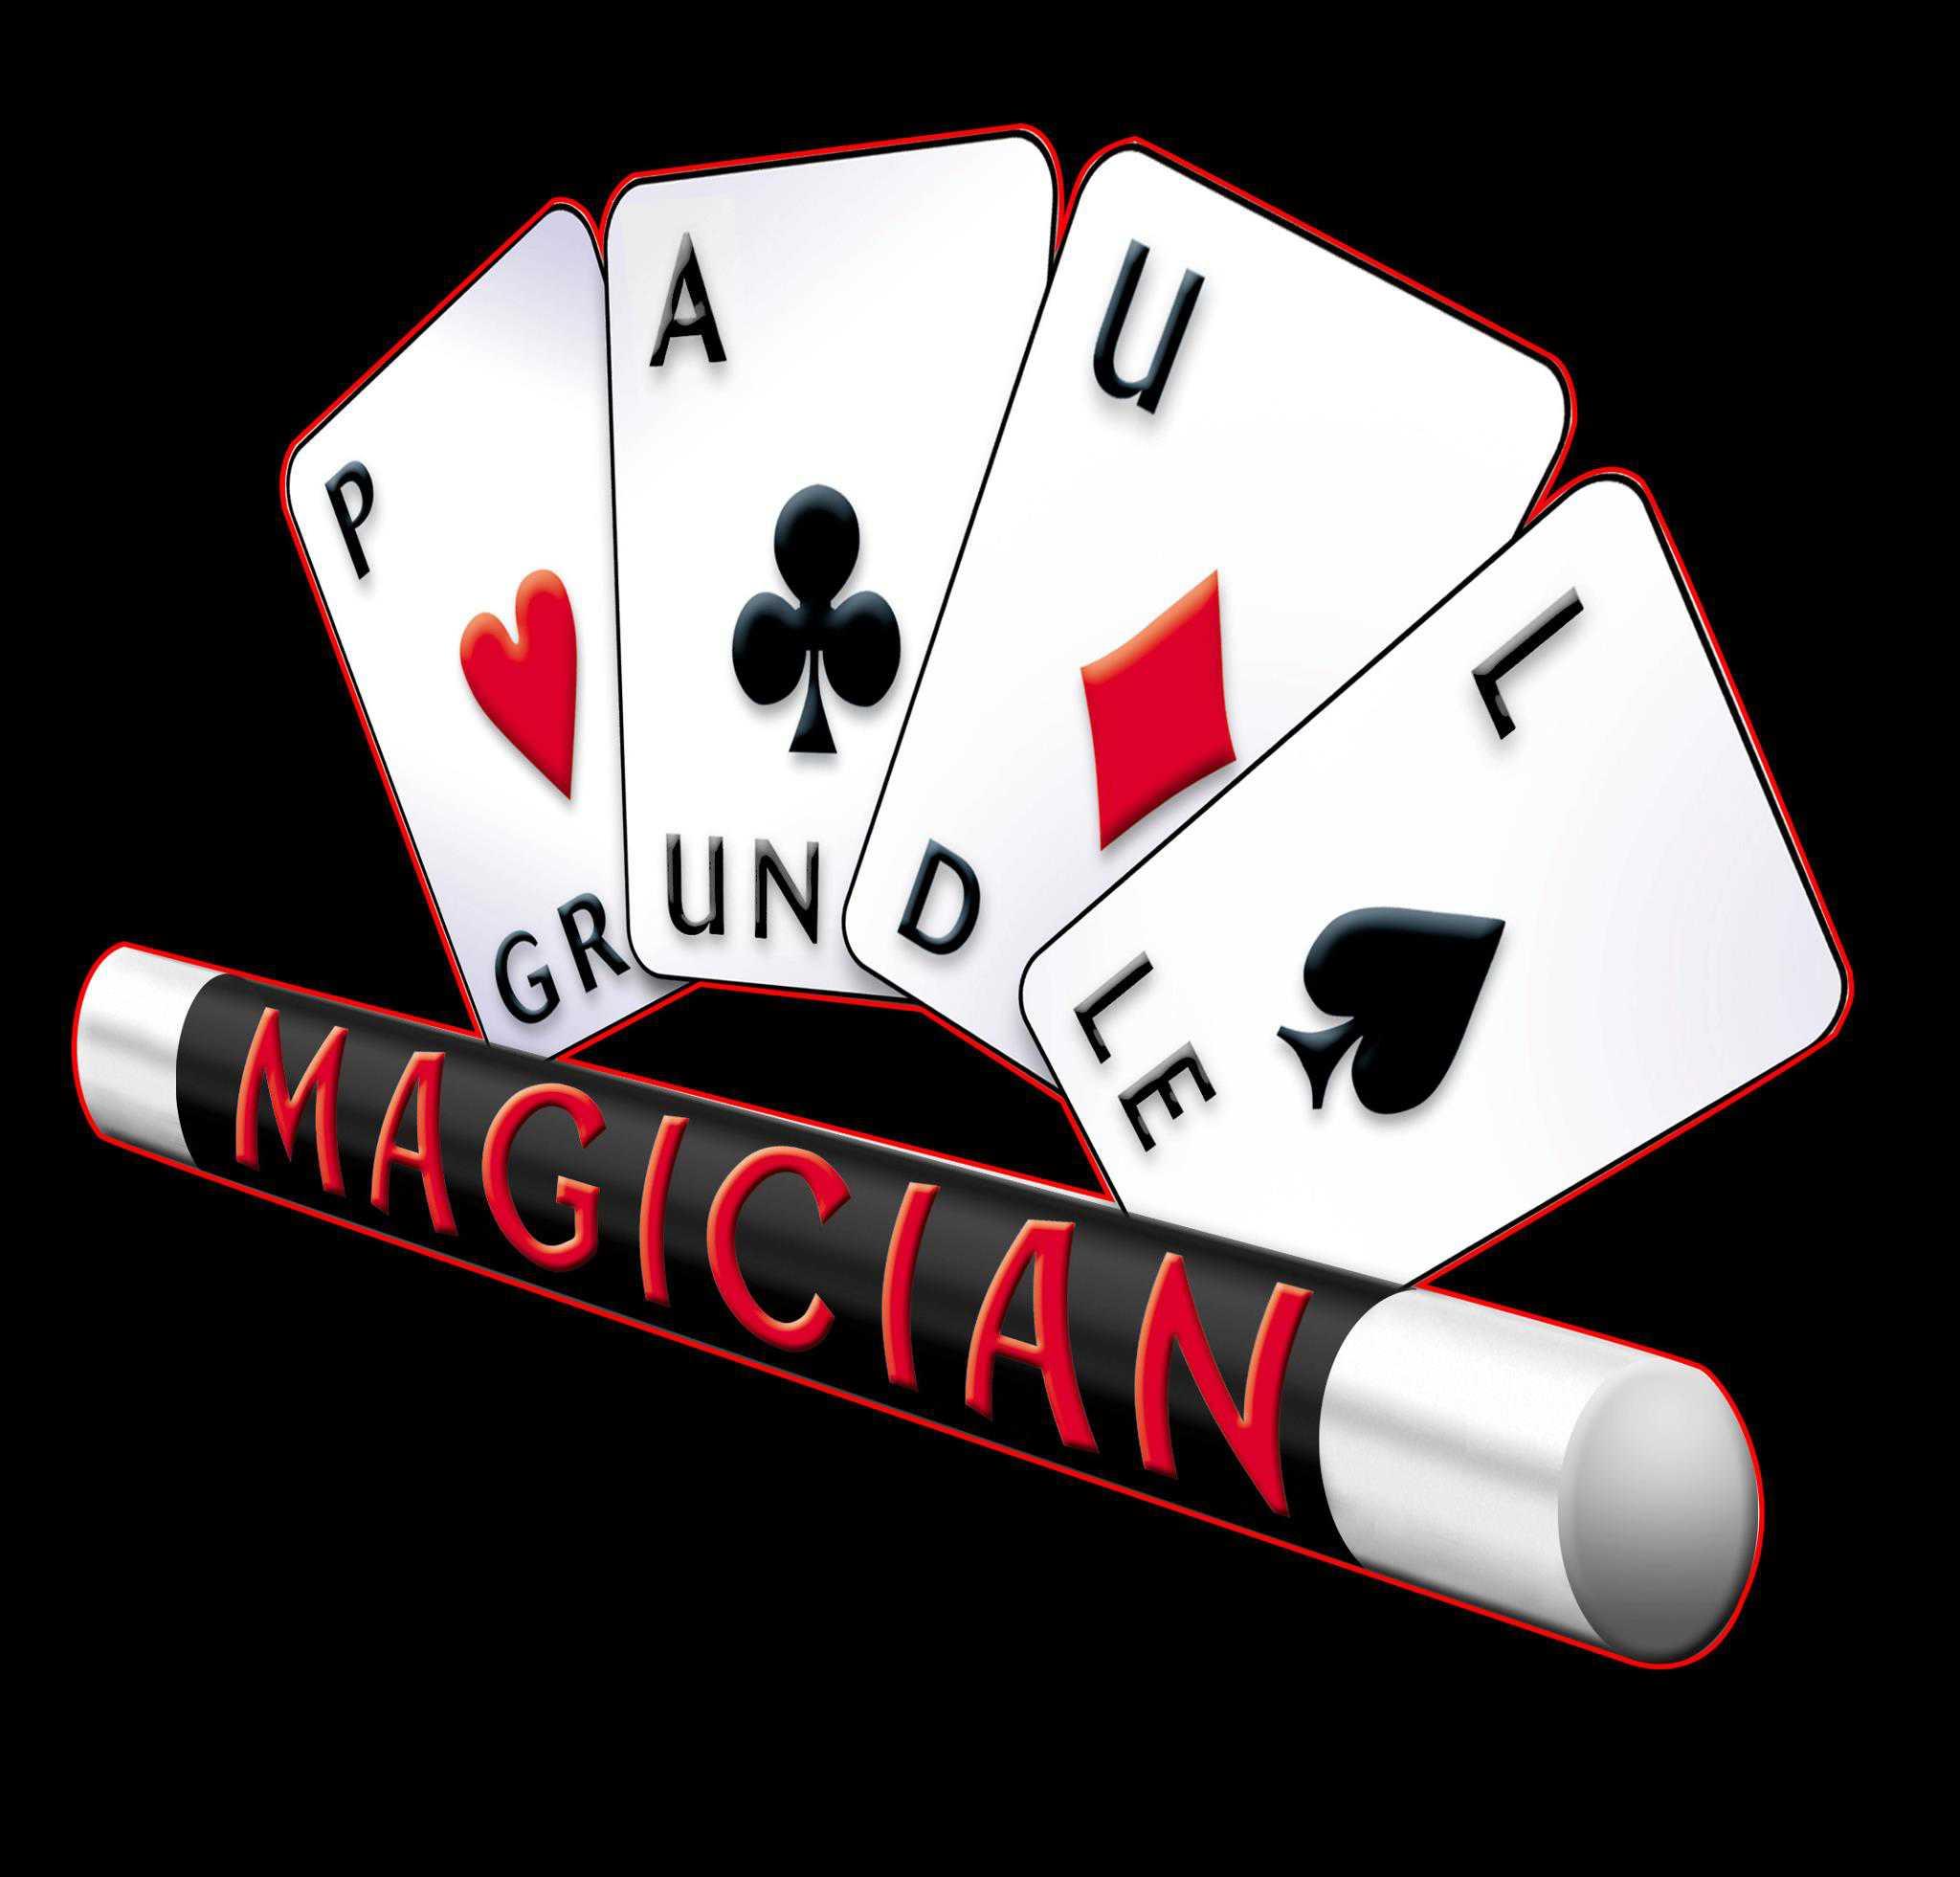 Paul Grundle Logo